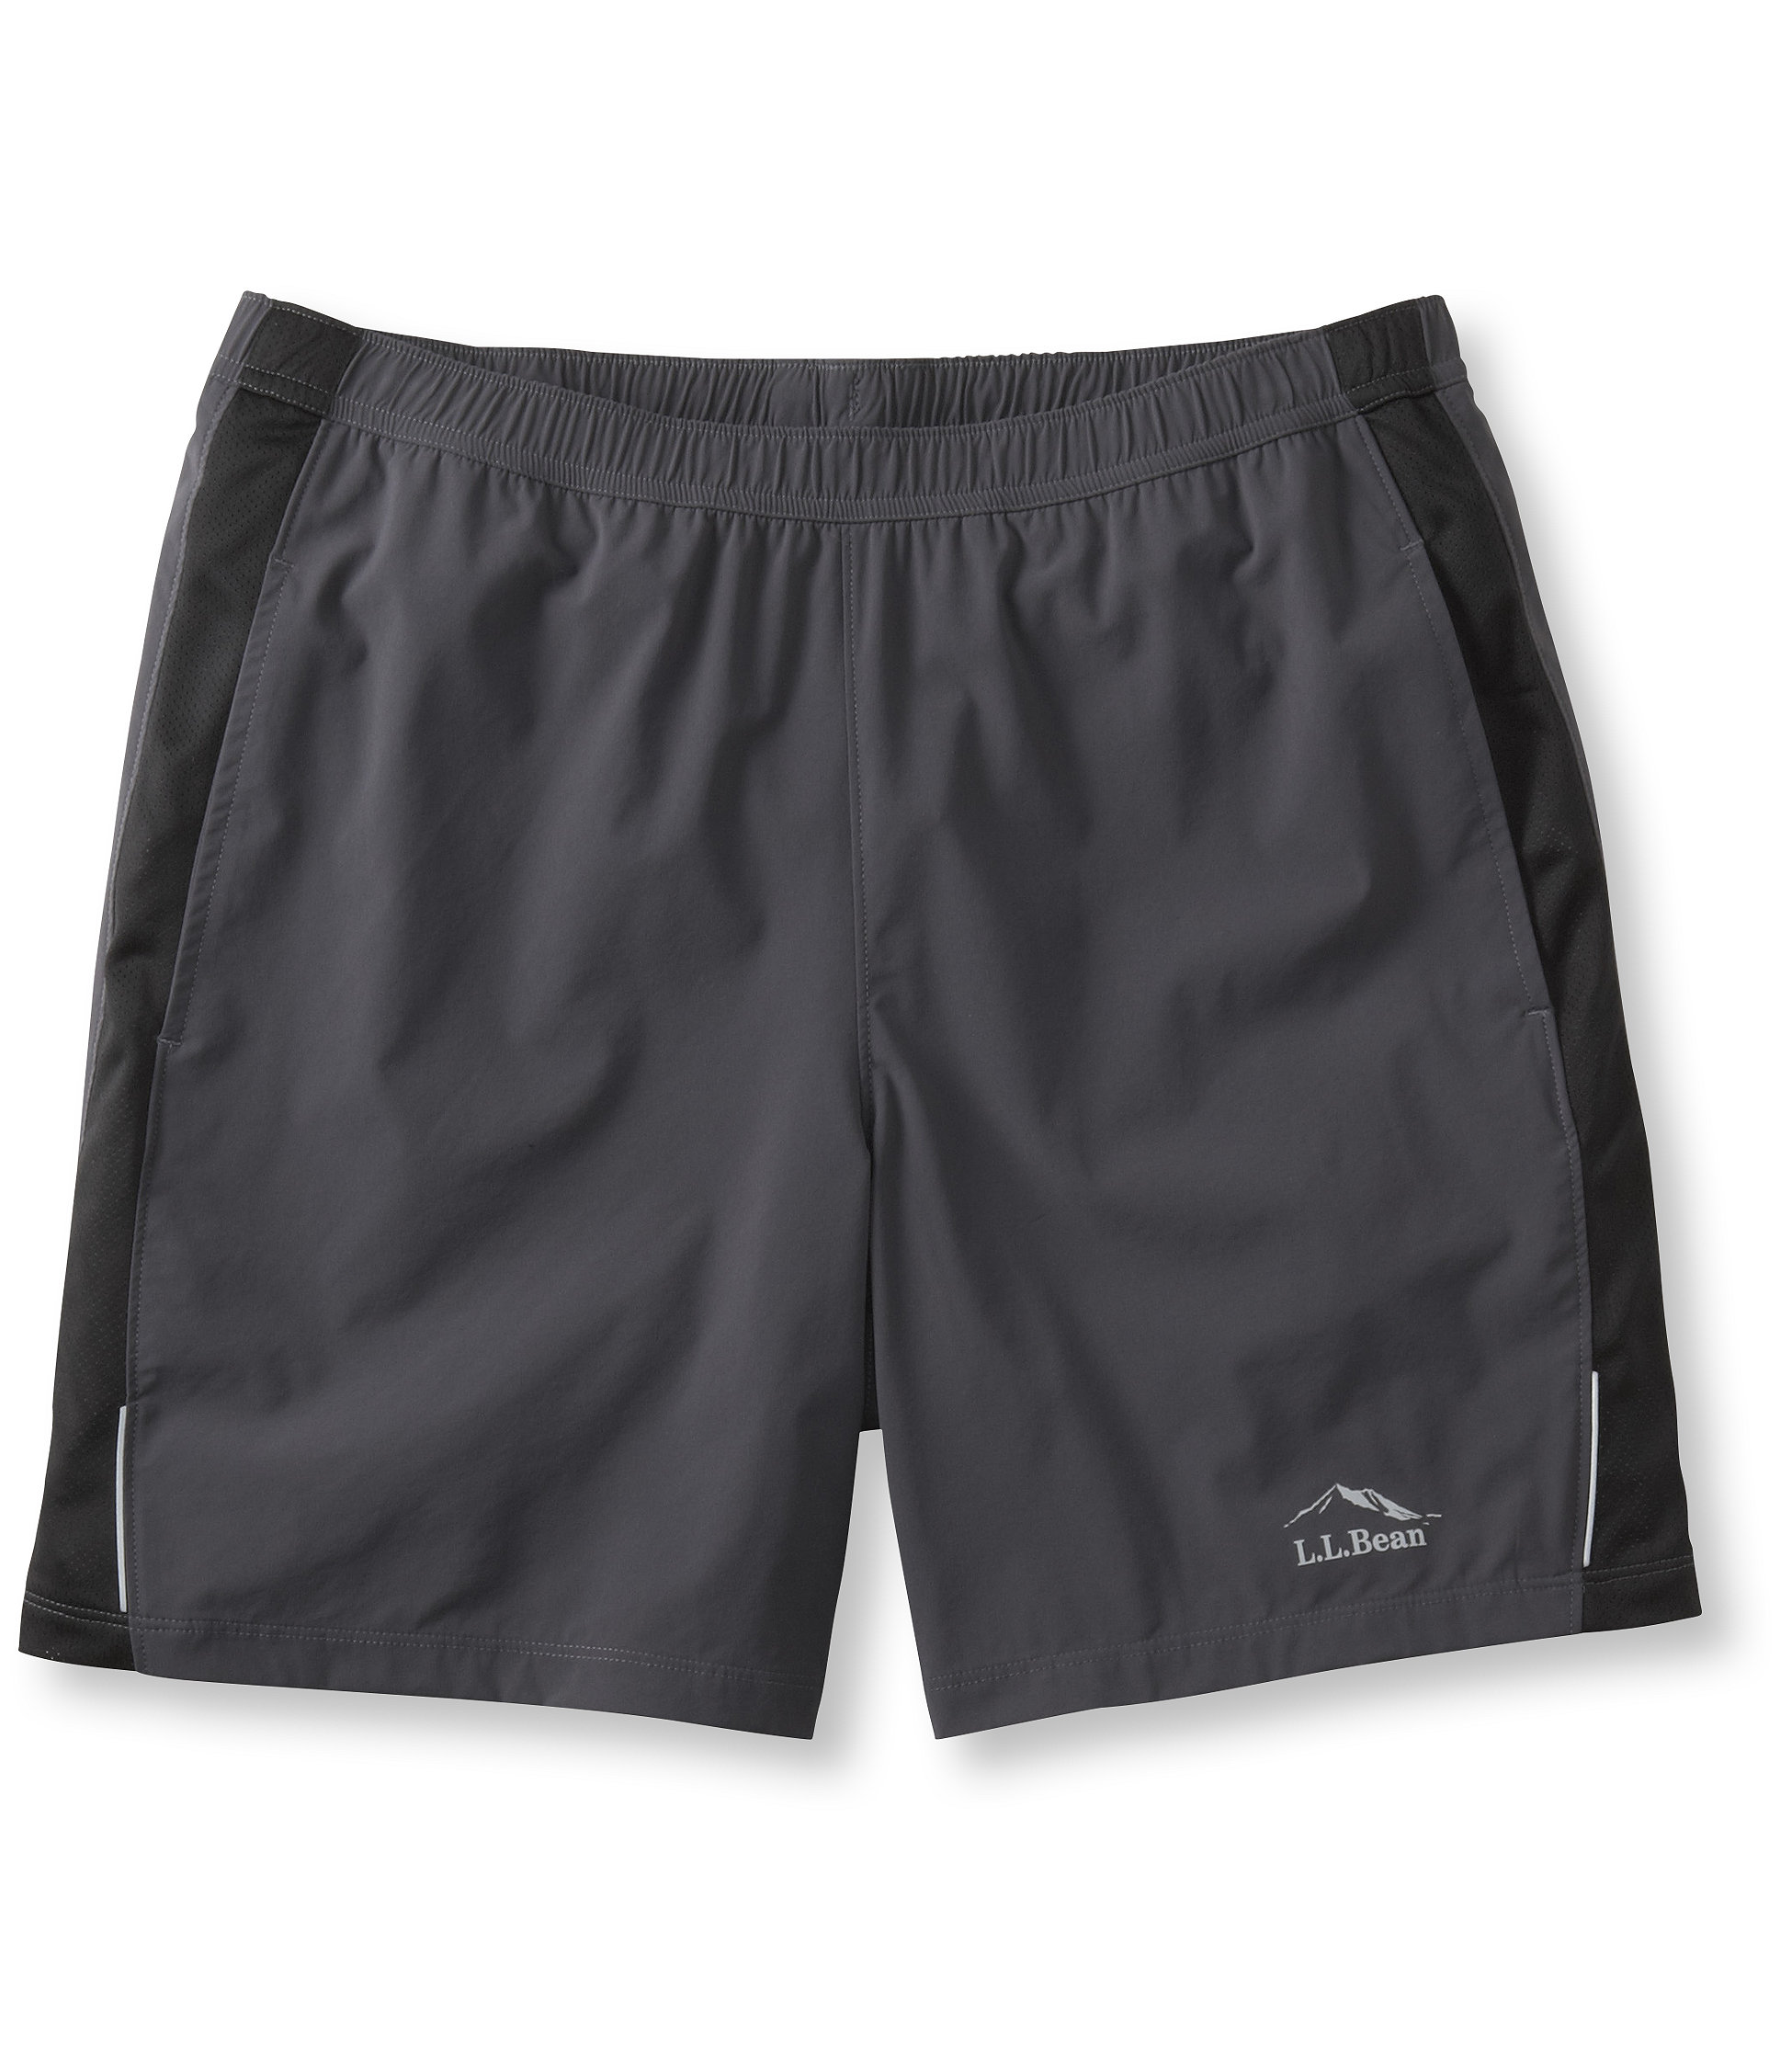 L.L.Bean Trail Runner Shorts